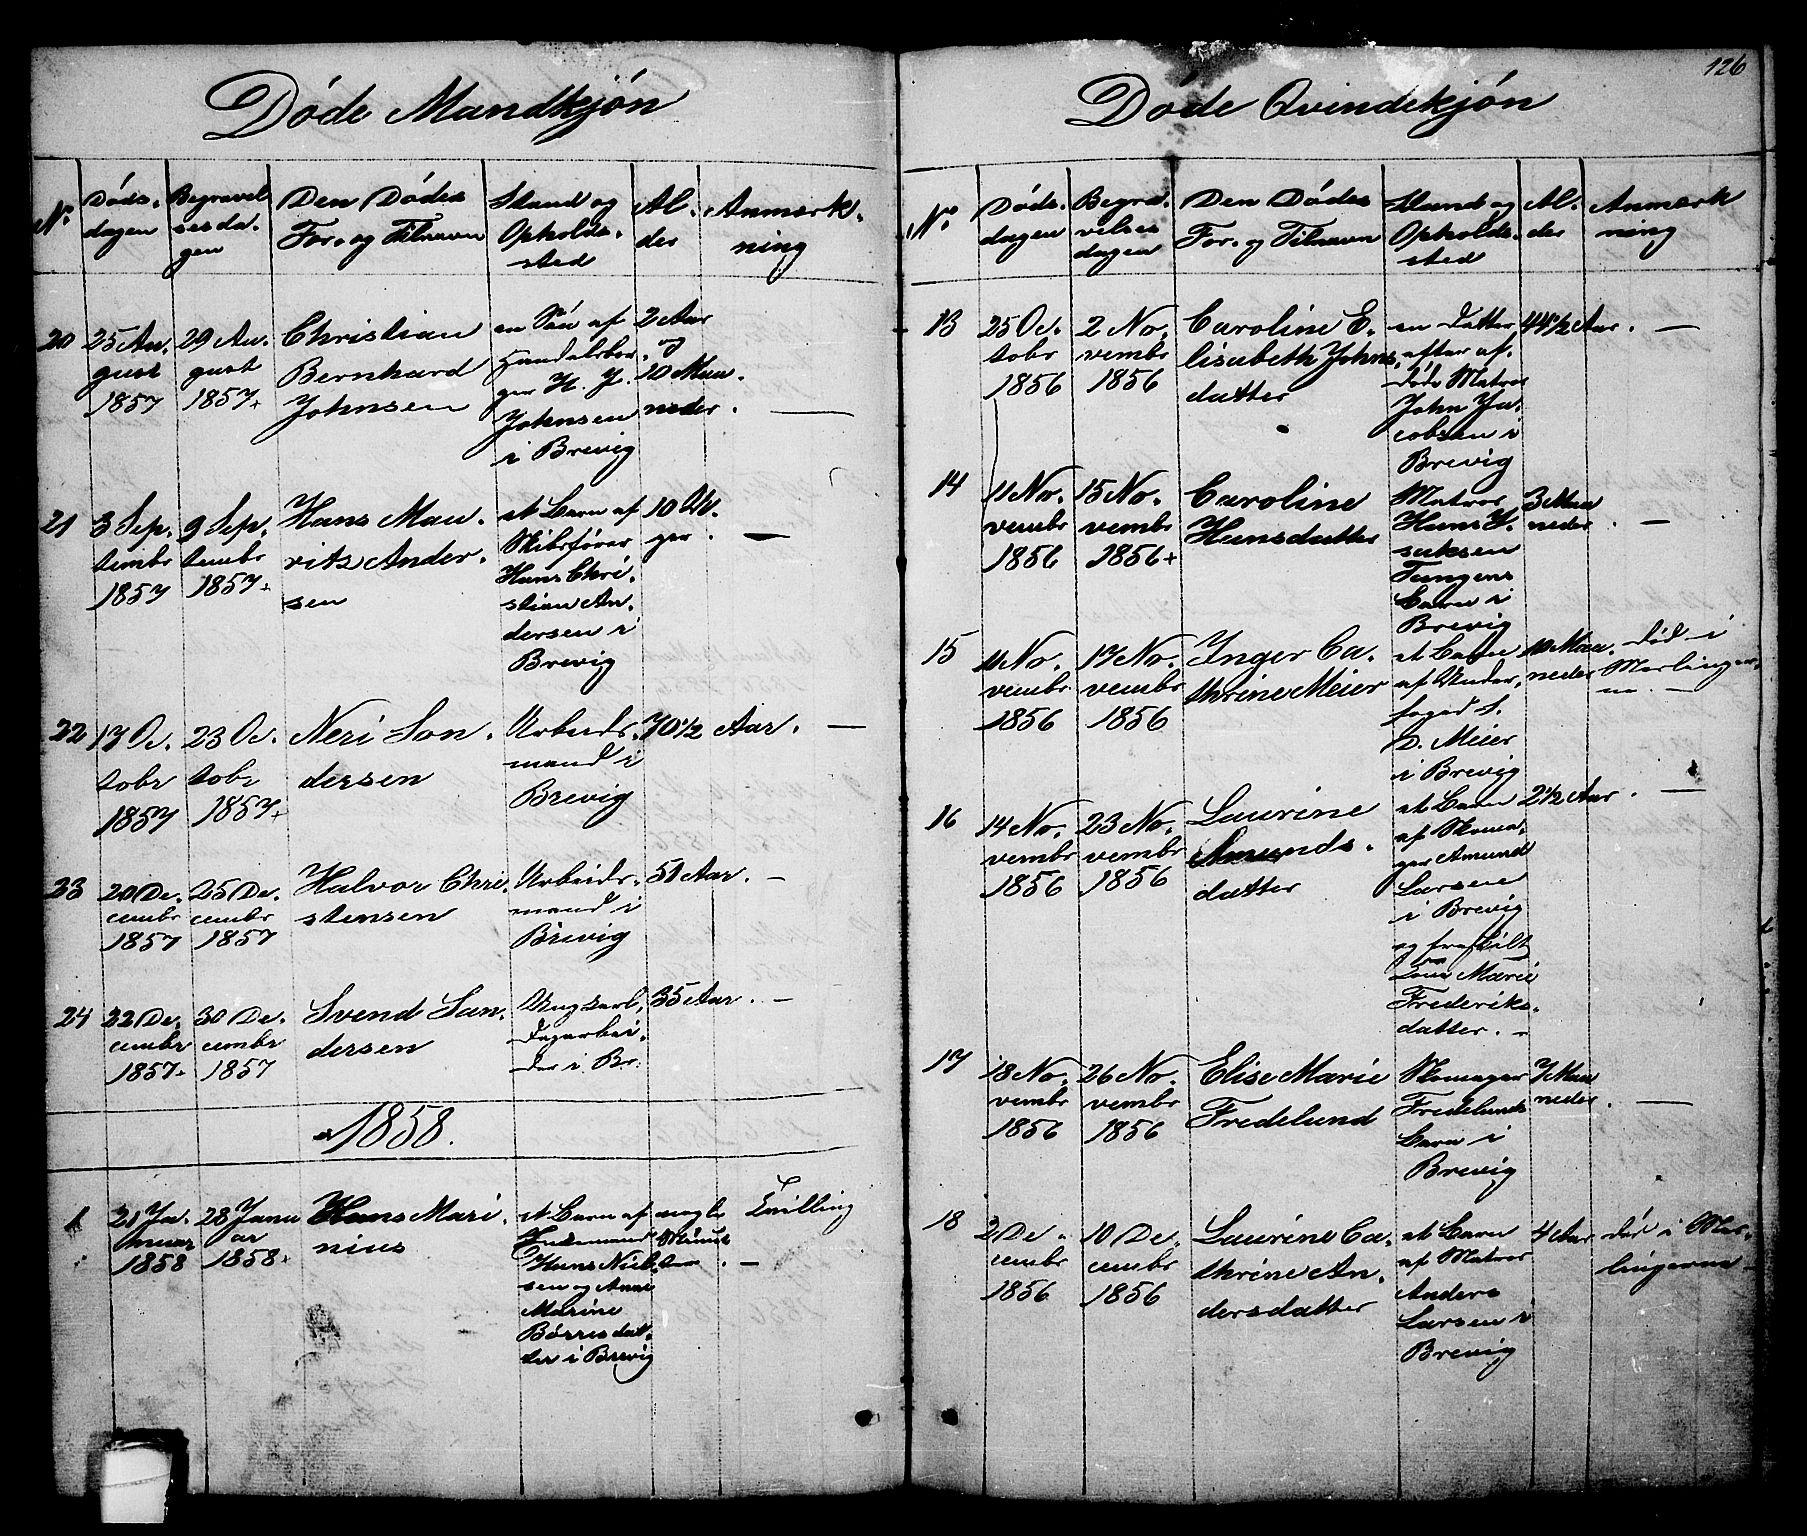 SAKO, Brevik kirkebøker, G/Ga/L0002: Klokkerbok nr. 2, 1846-1865, s. 126